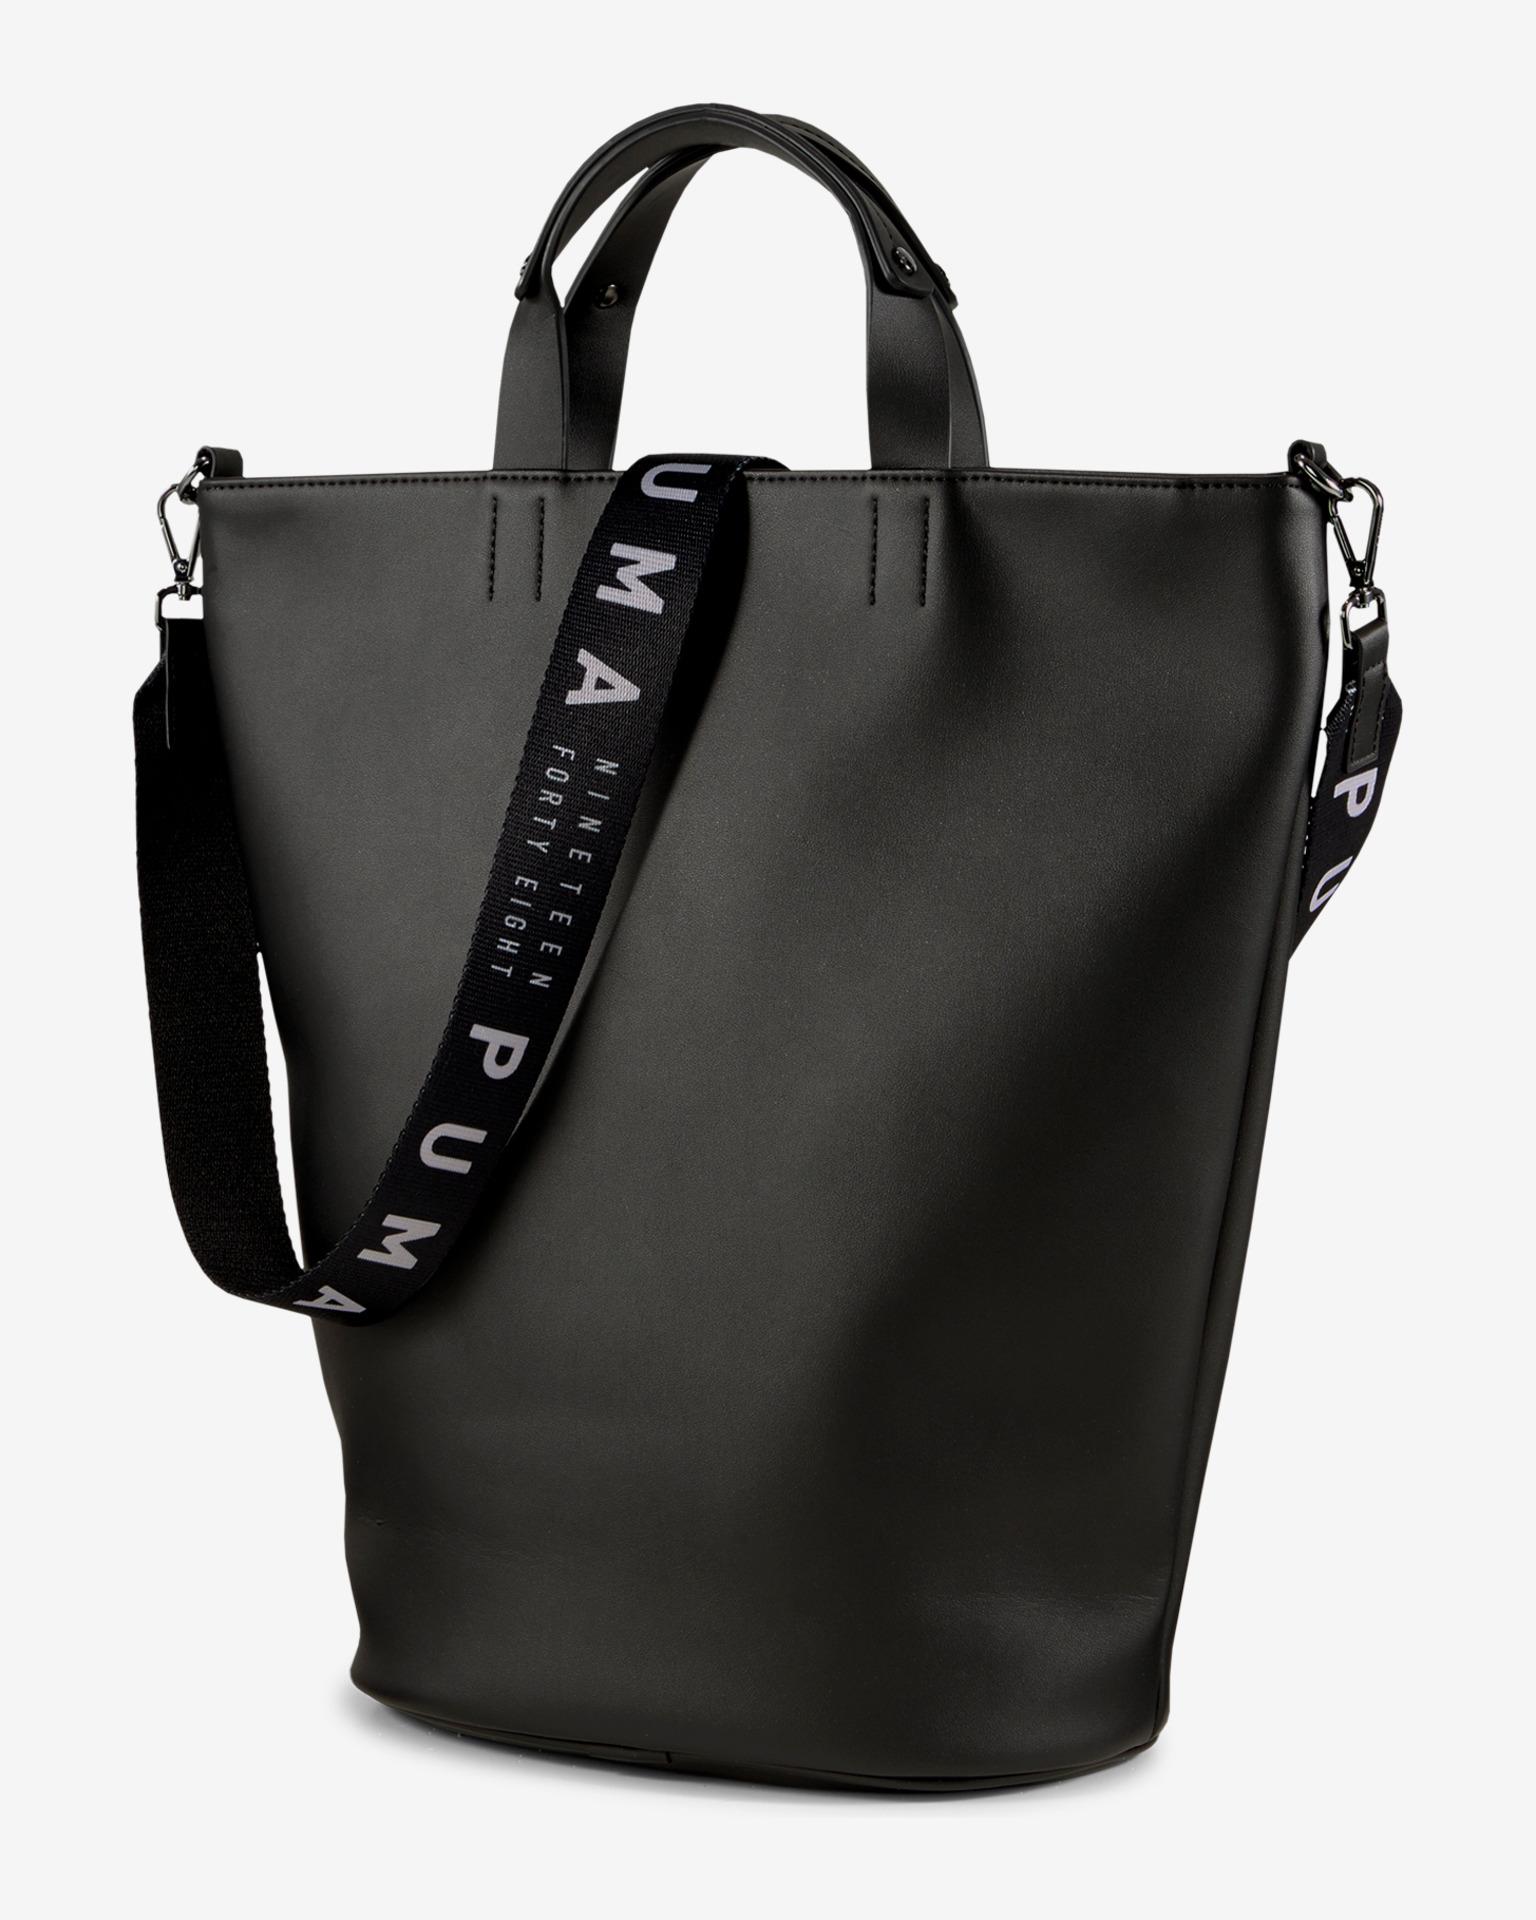 Puma Women's bag black Kabelka